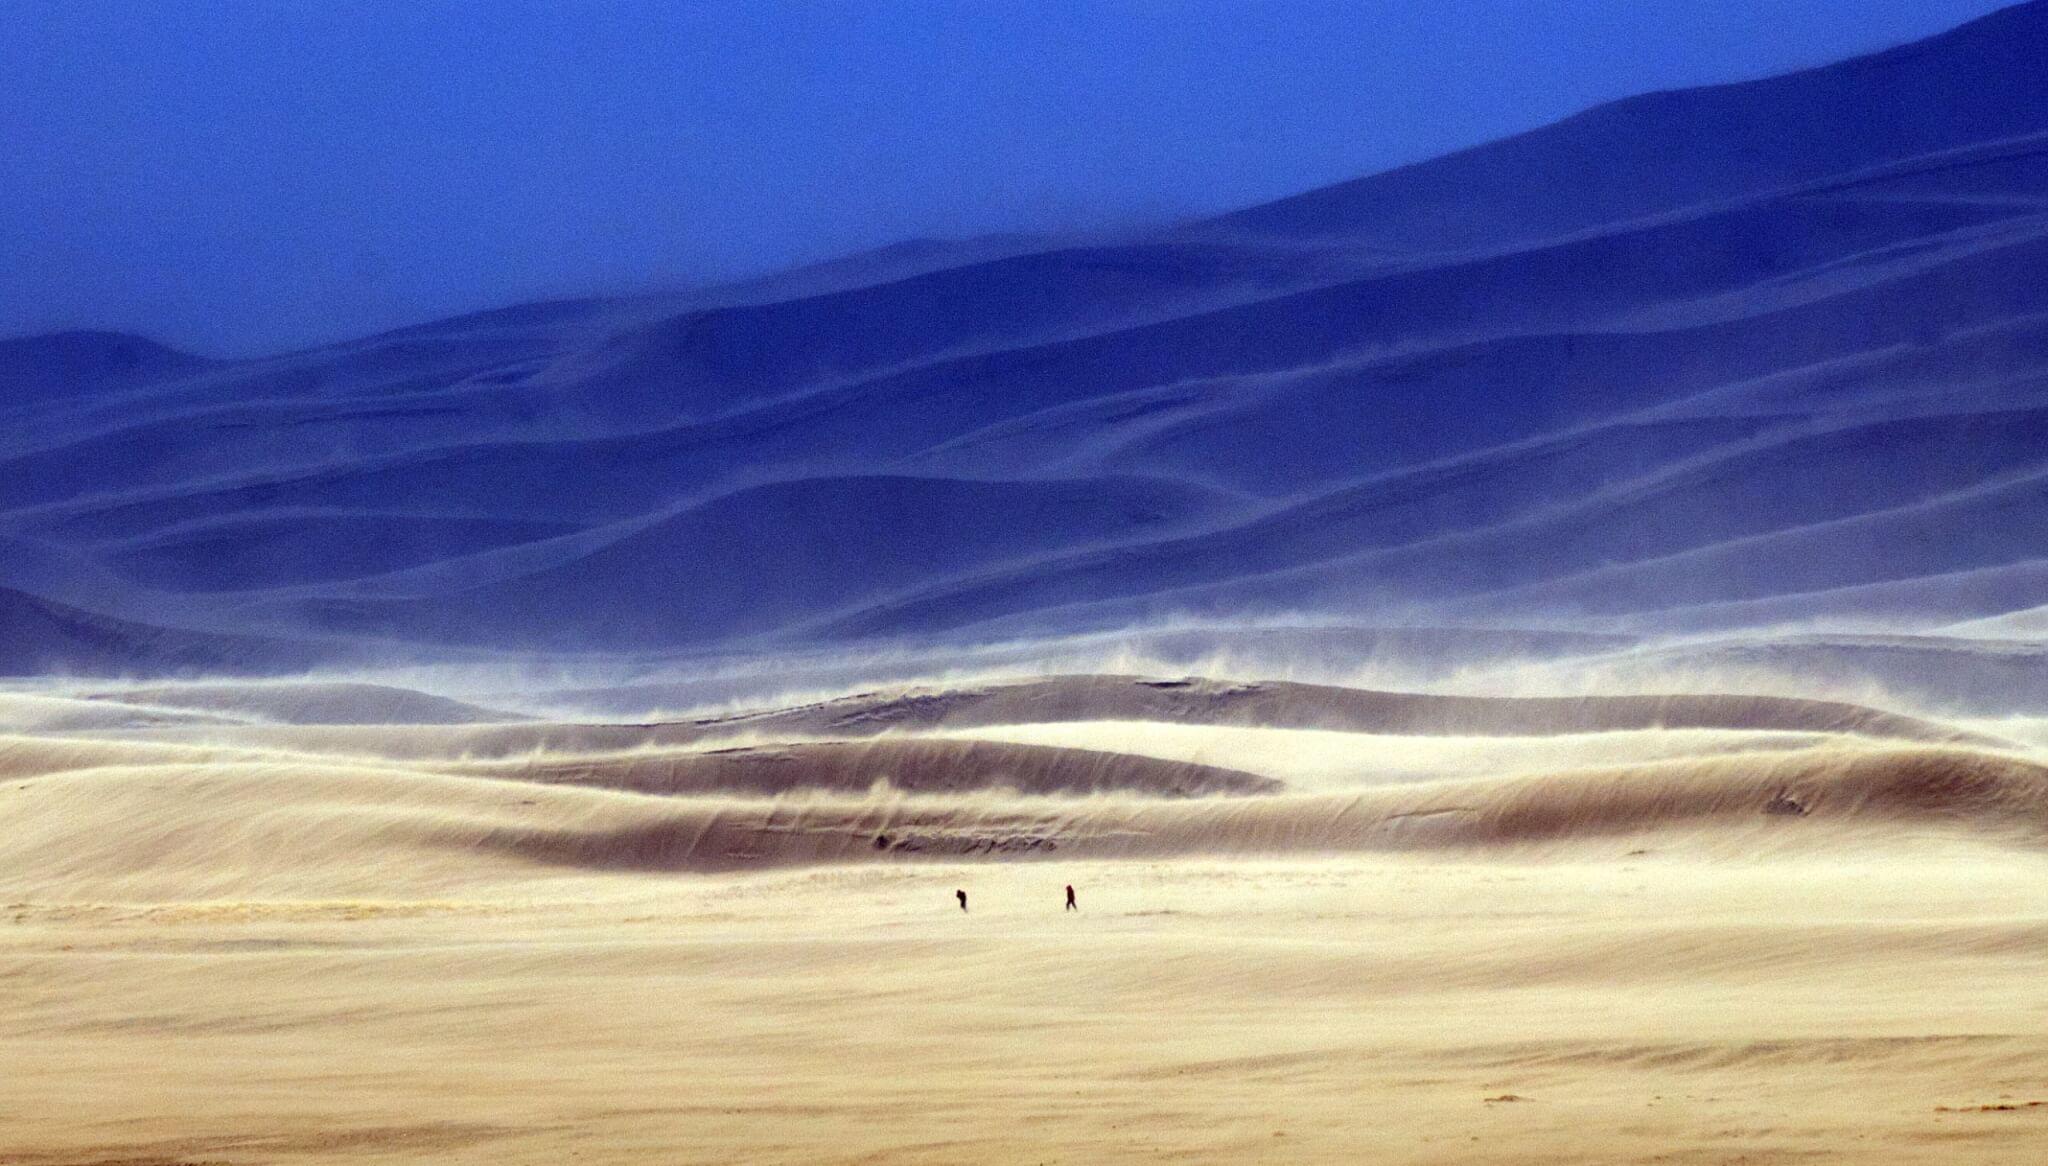 U.S. National Park Status COVID-19_Great Sand Dunes National Park